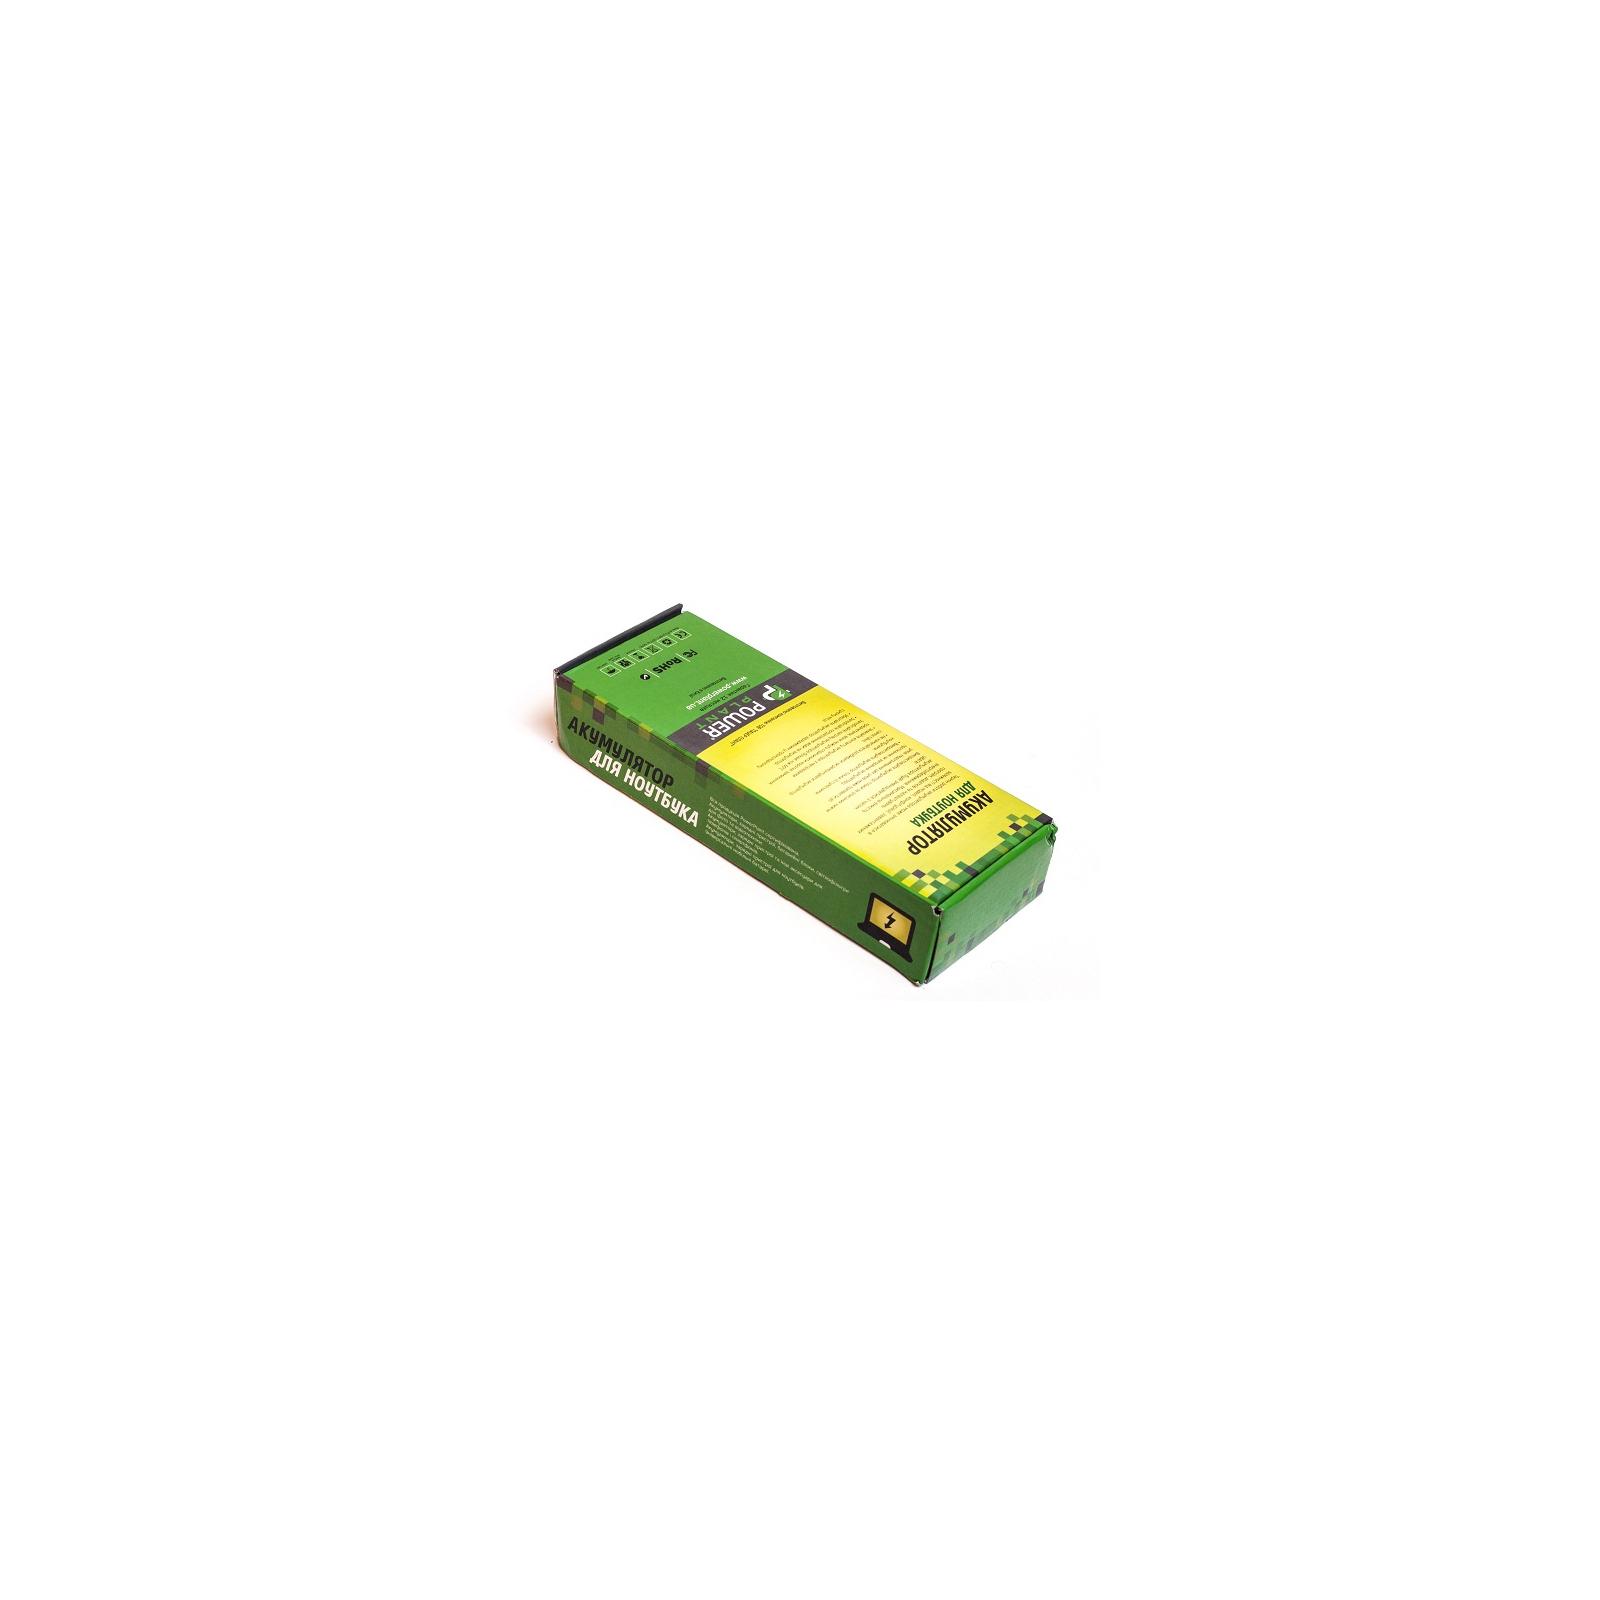 Аккумулятор для ноутбука SAMSUNG M60 (AA-PB2NC3B, SG6560LH) 11.1V 5200mAh PowerPlant (NB00000151) изображение 2